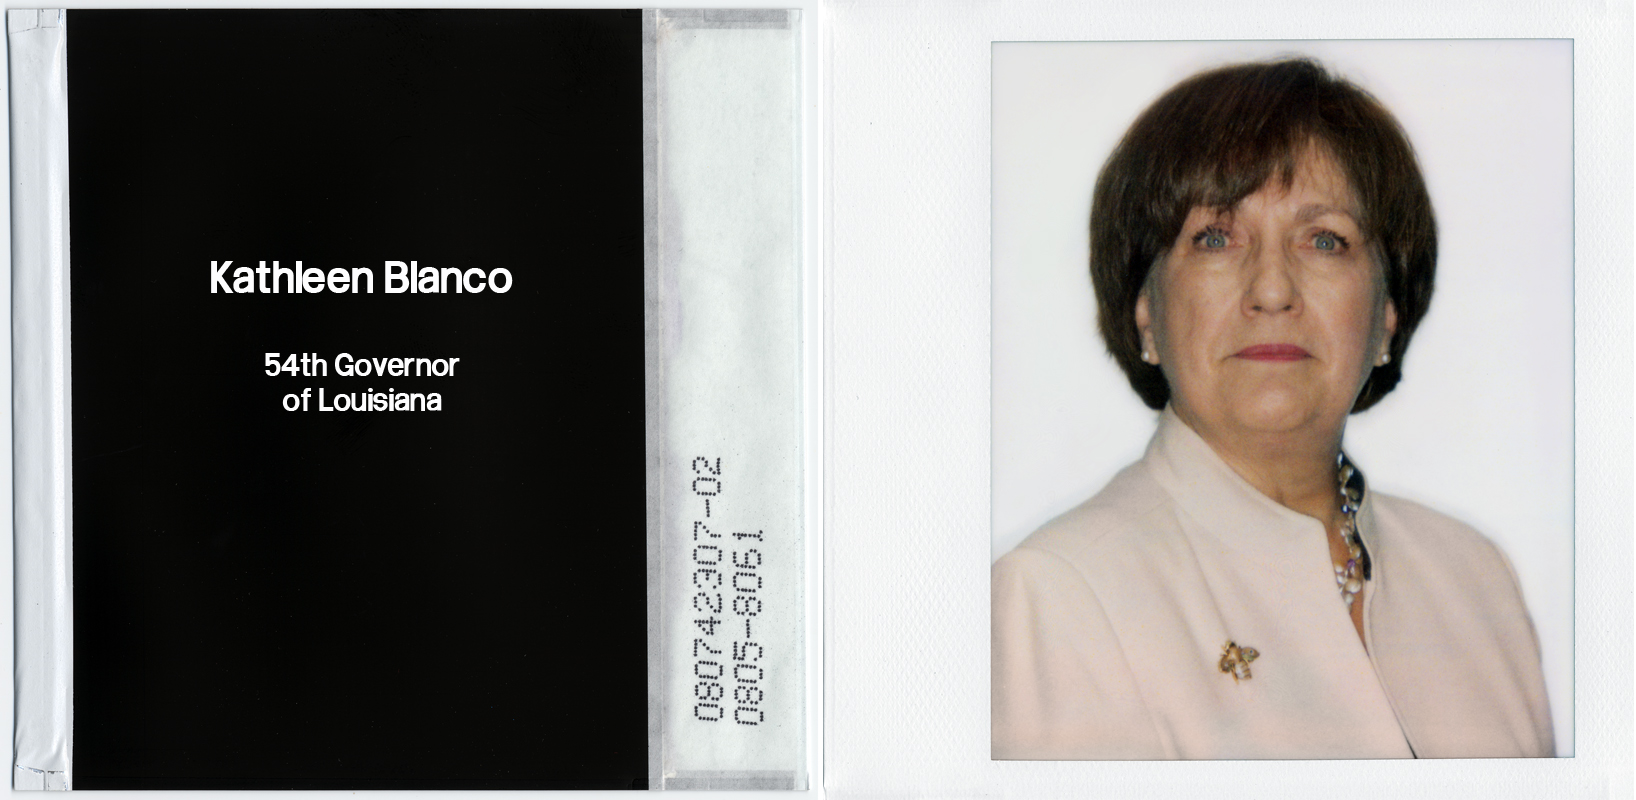 2. Kathleen Blanco.jpg